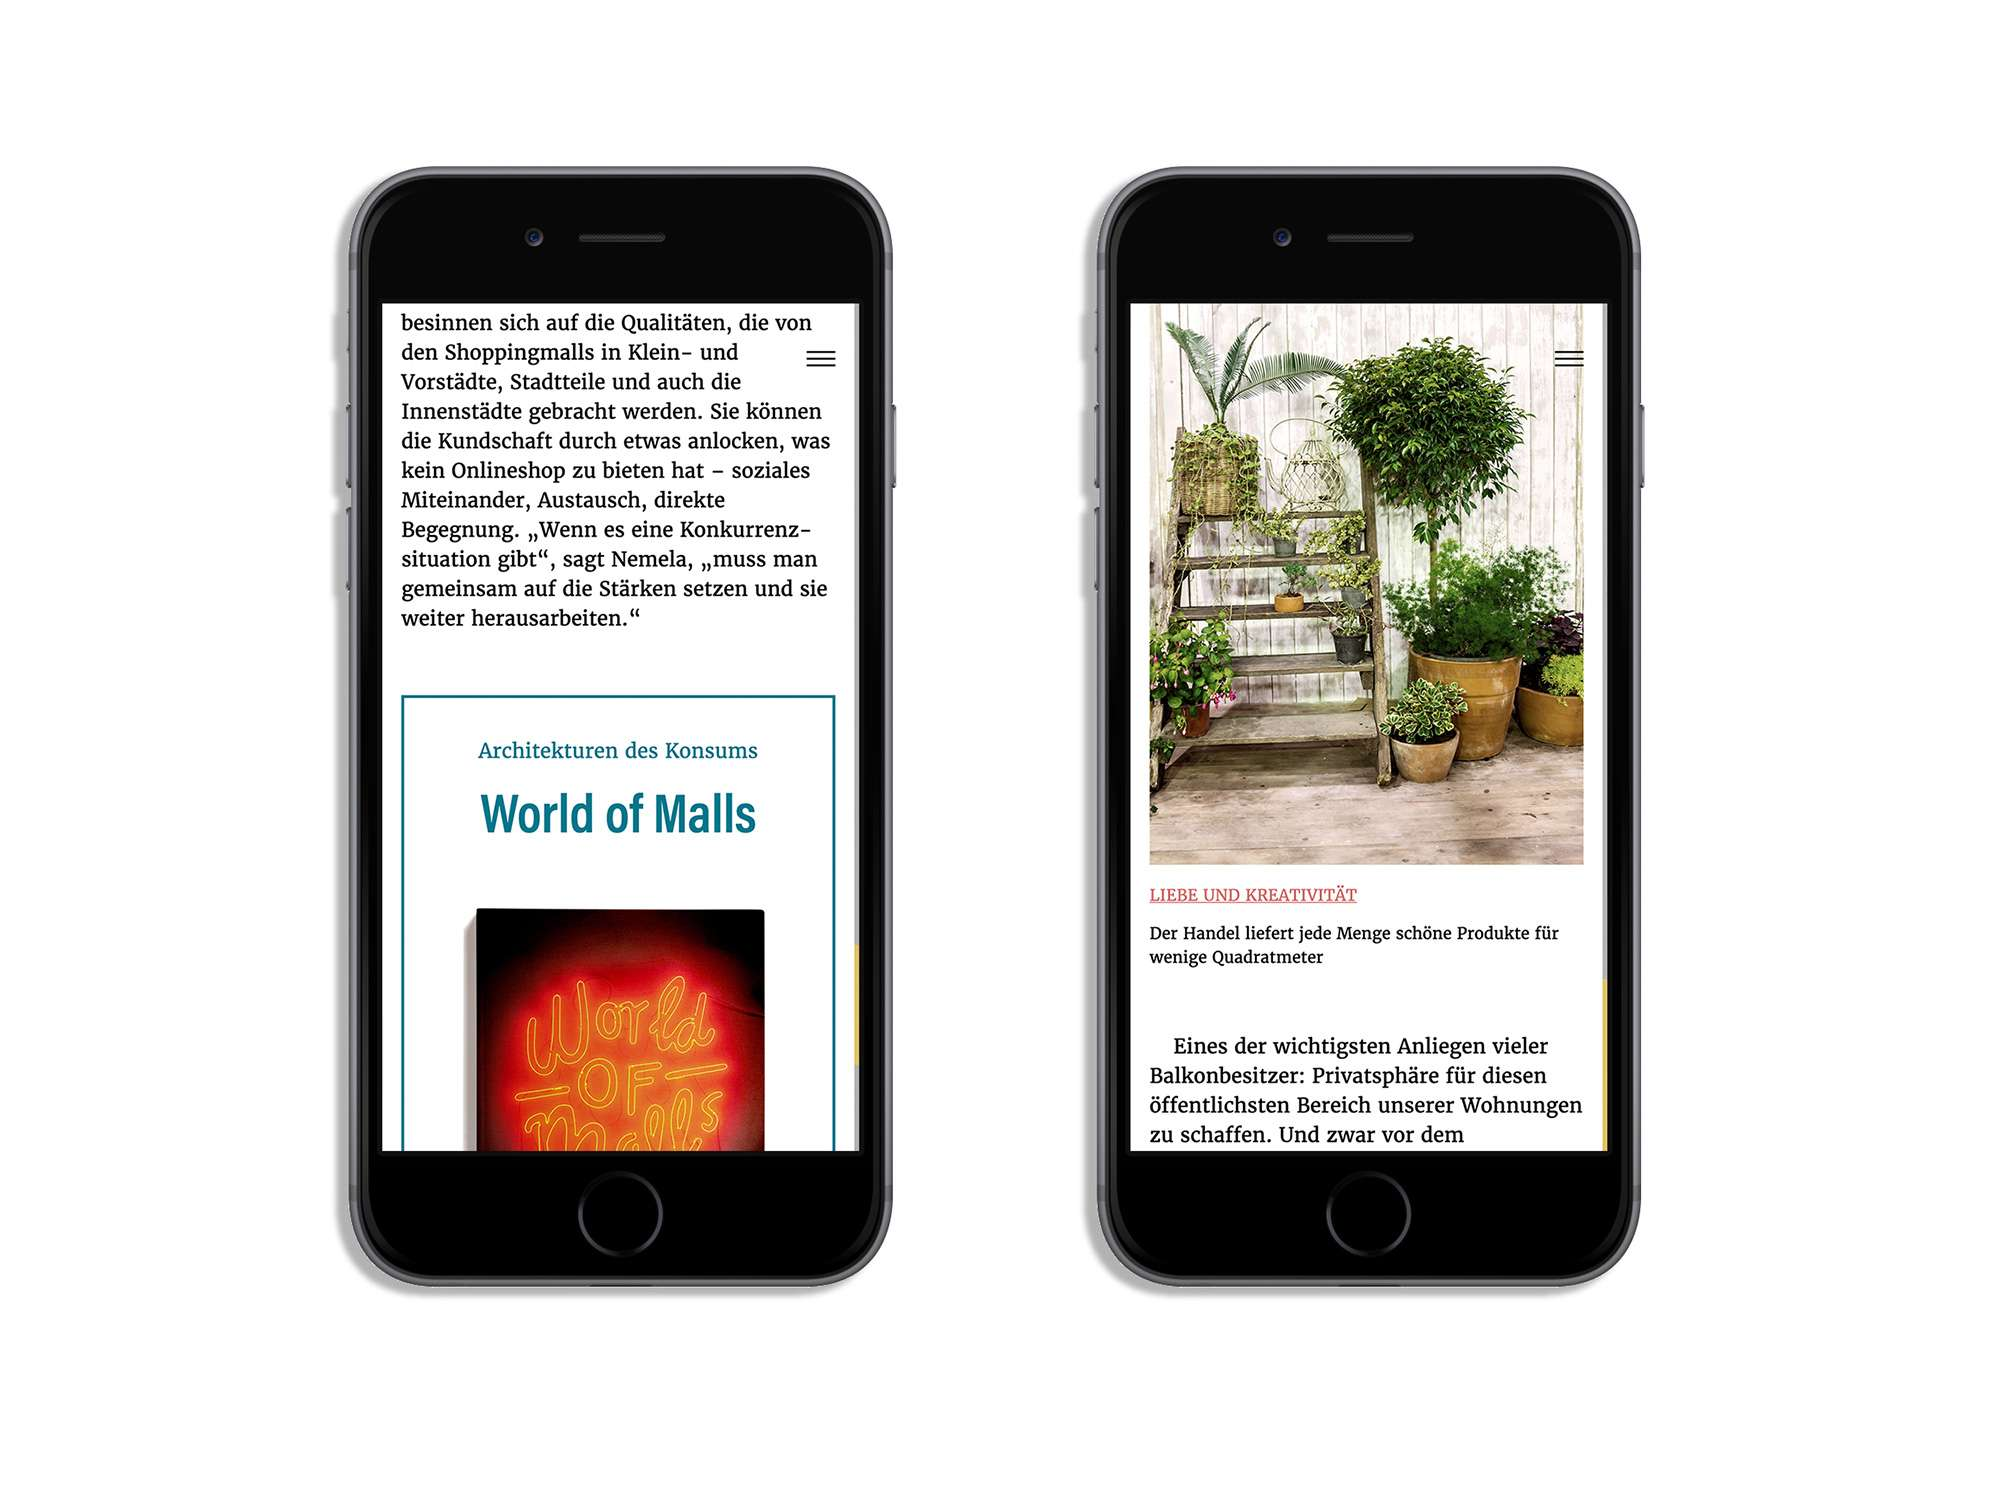 btb-tdc-online-magazin-21